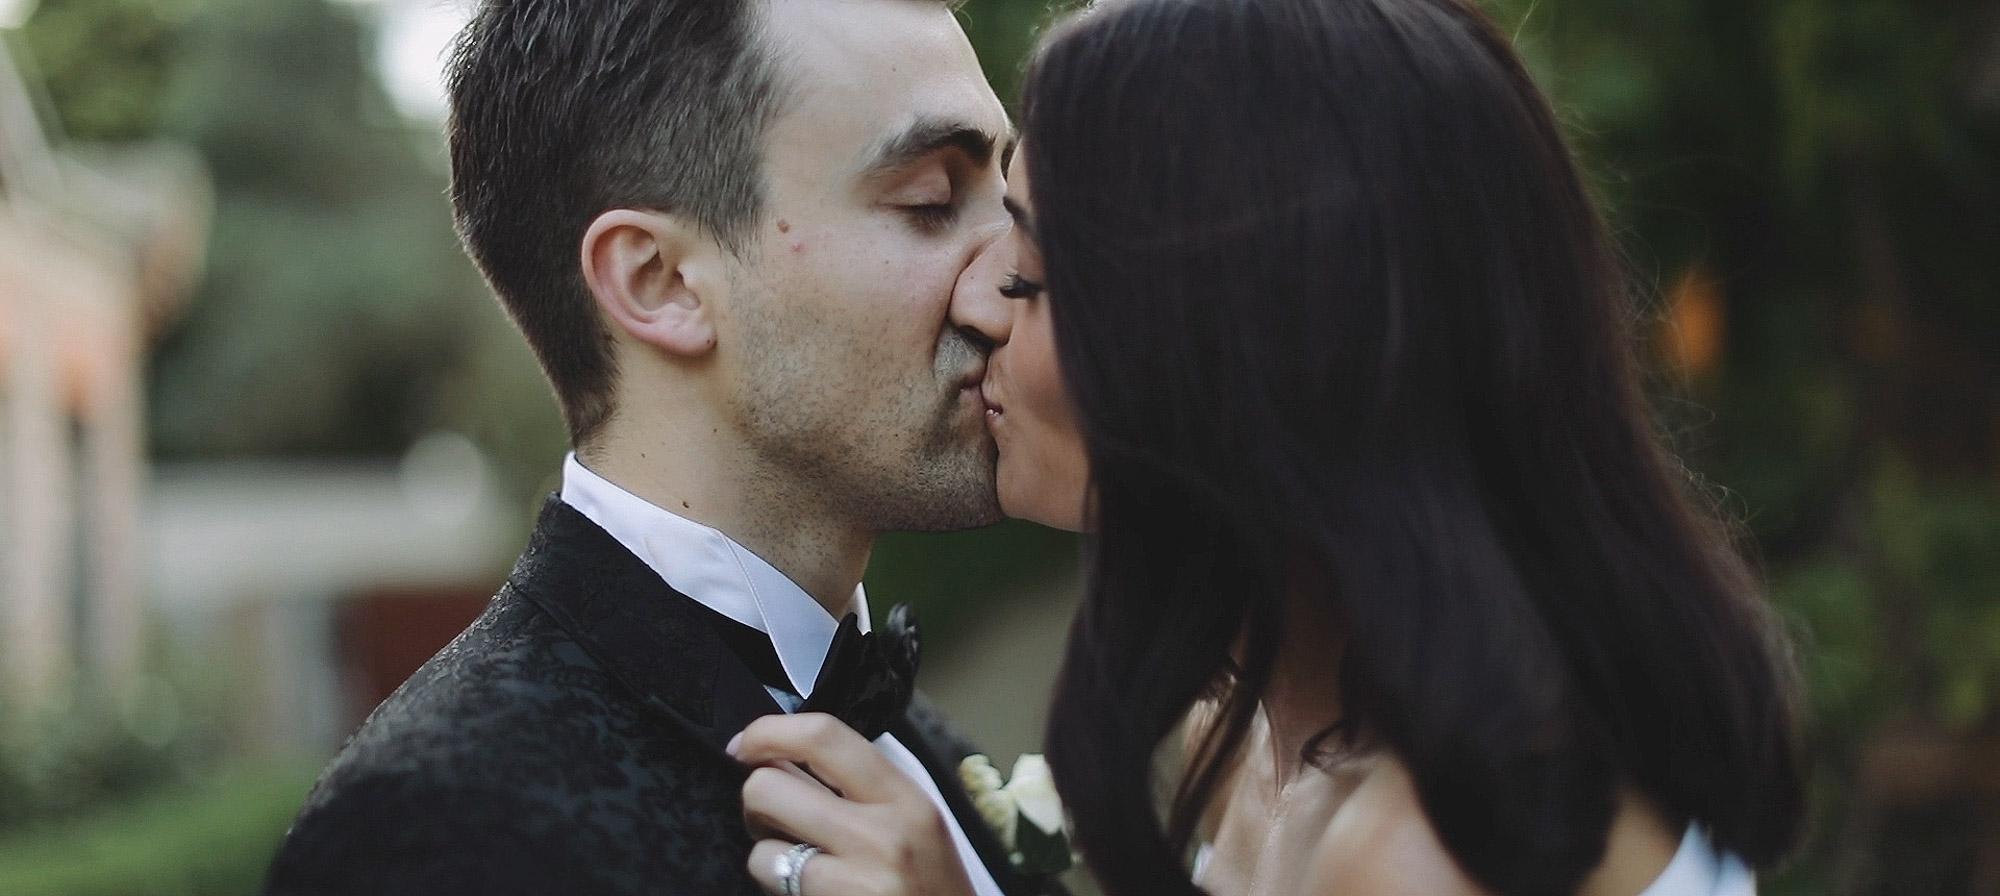 Annette and Dani Films - Burgess Video -  Melbourne Wedding Videoraphers  -Steph and Jesse_-2.jpg